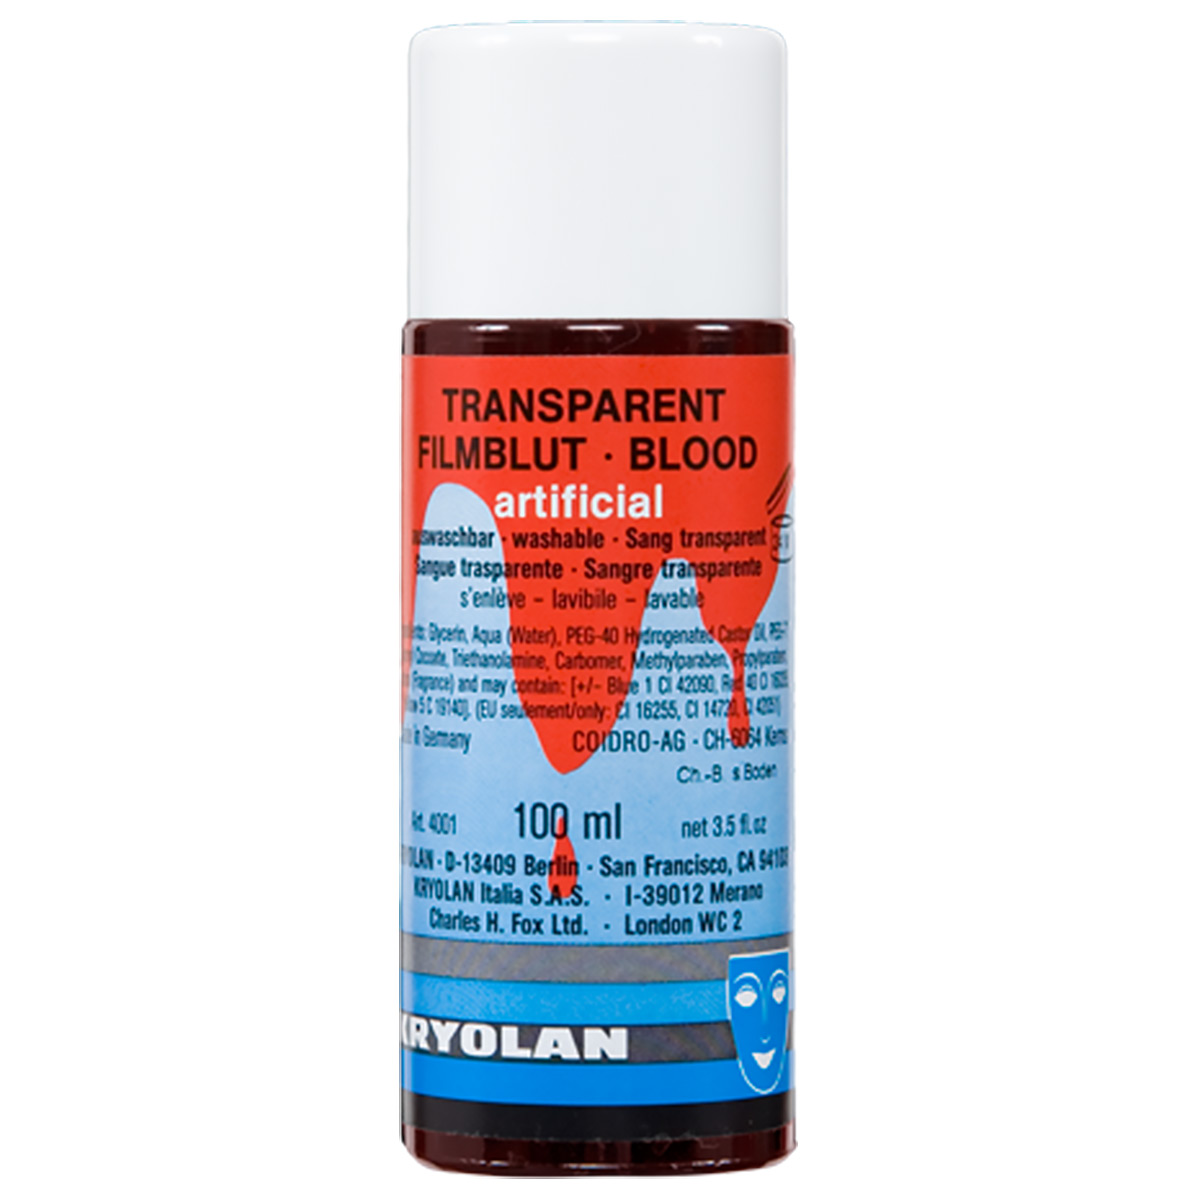 Blod, transparent 100ml medium